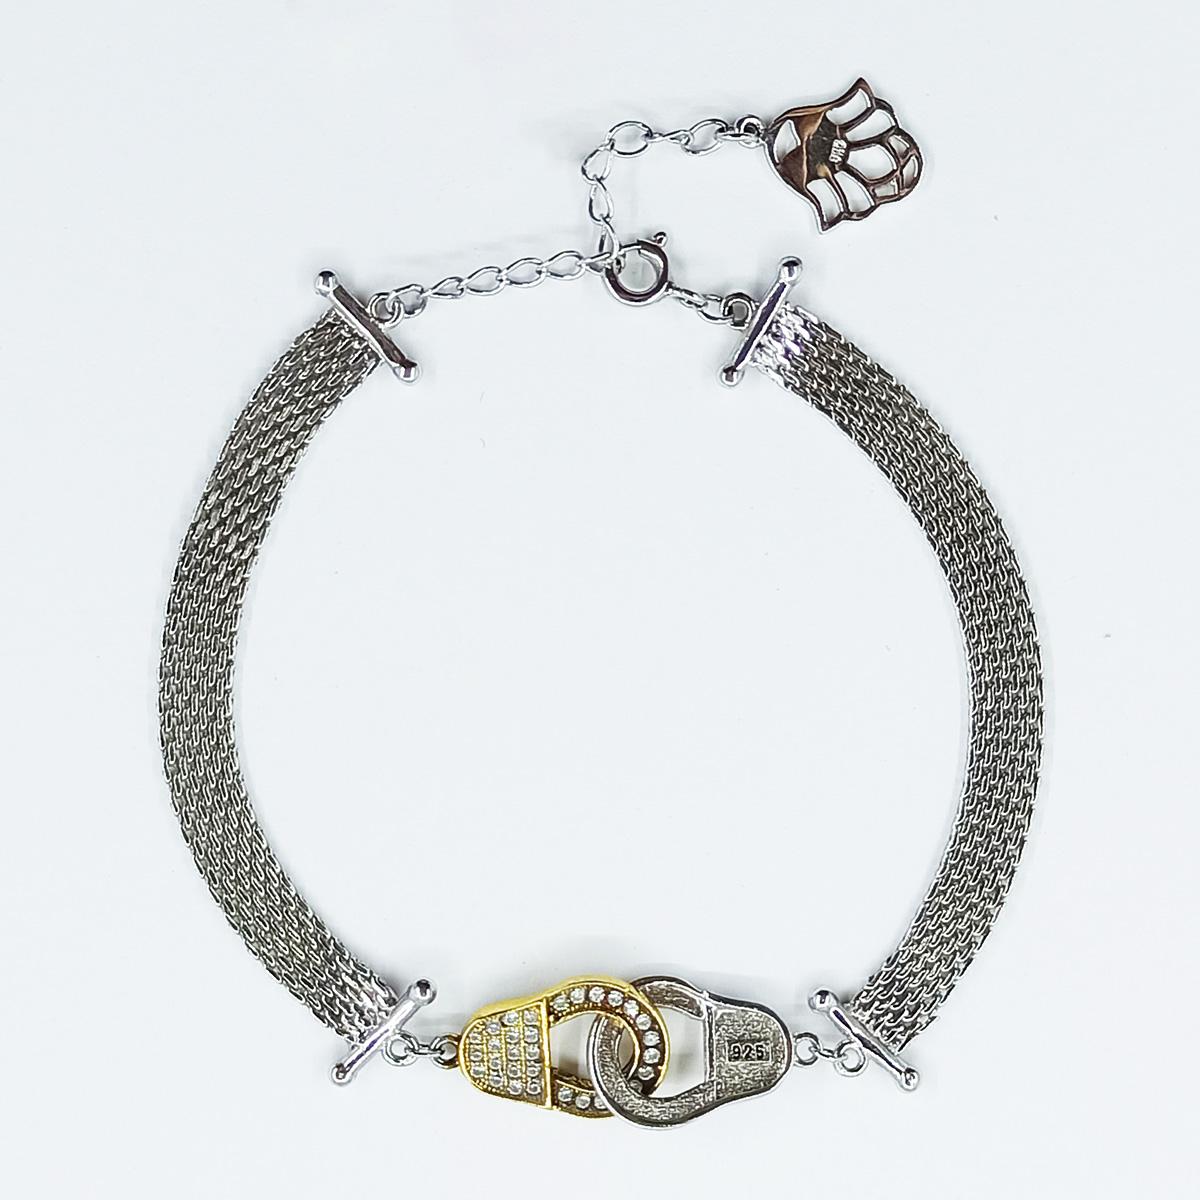 دستبند نقره زنانه سلین کالا مدل ce-As101